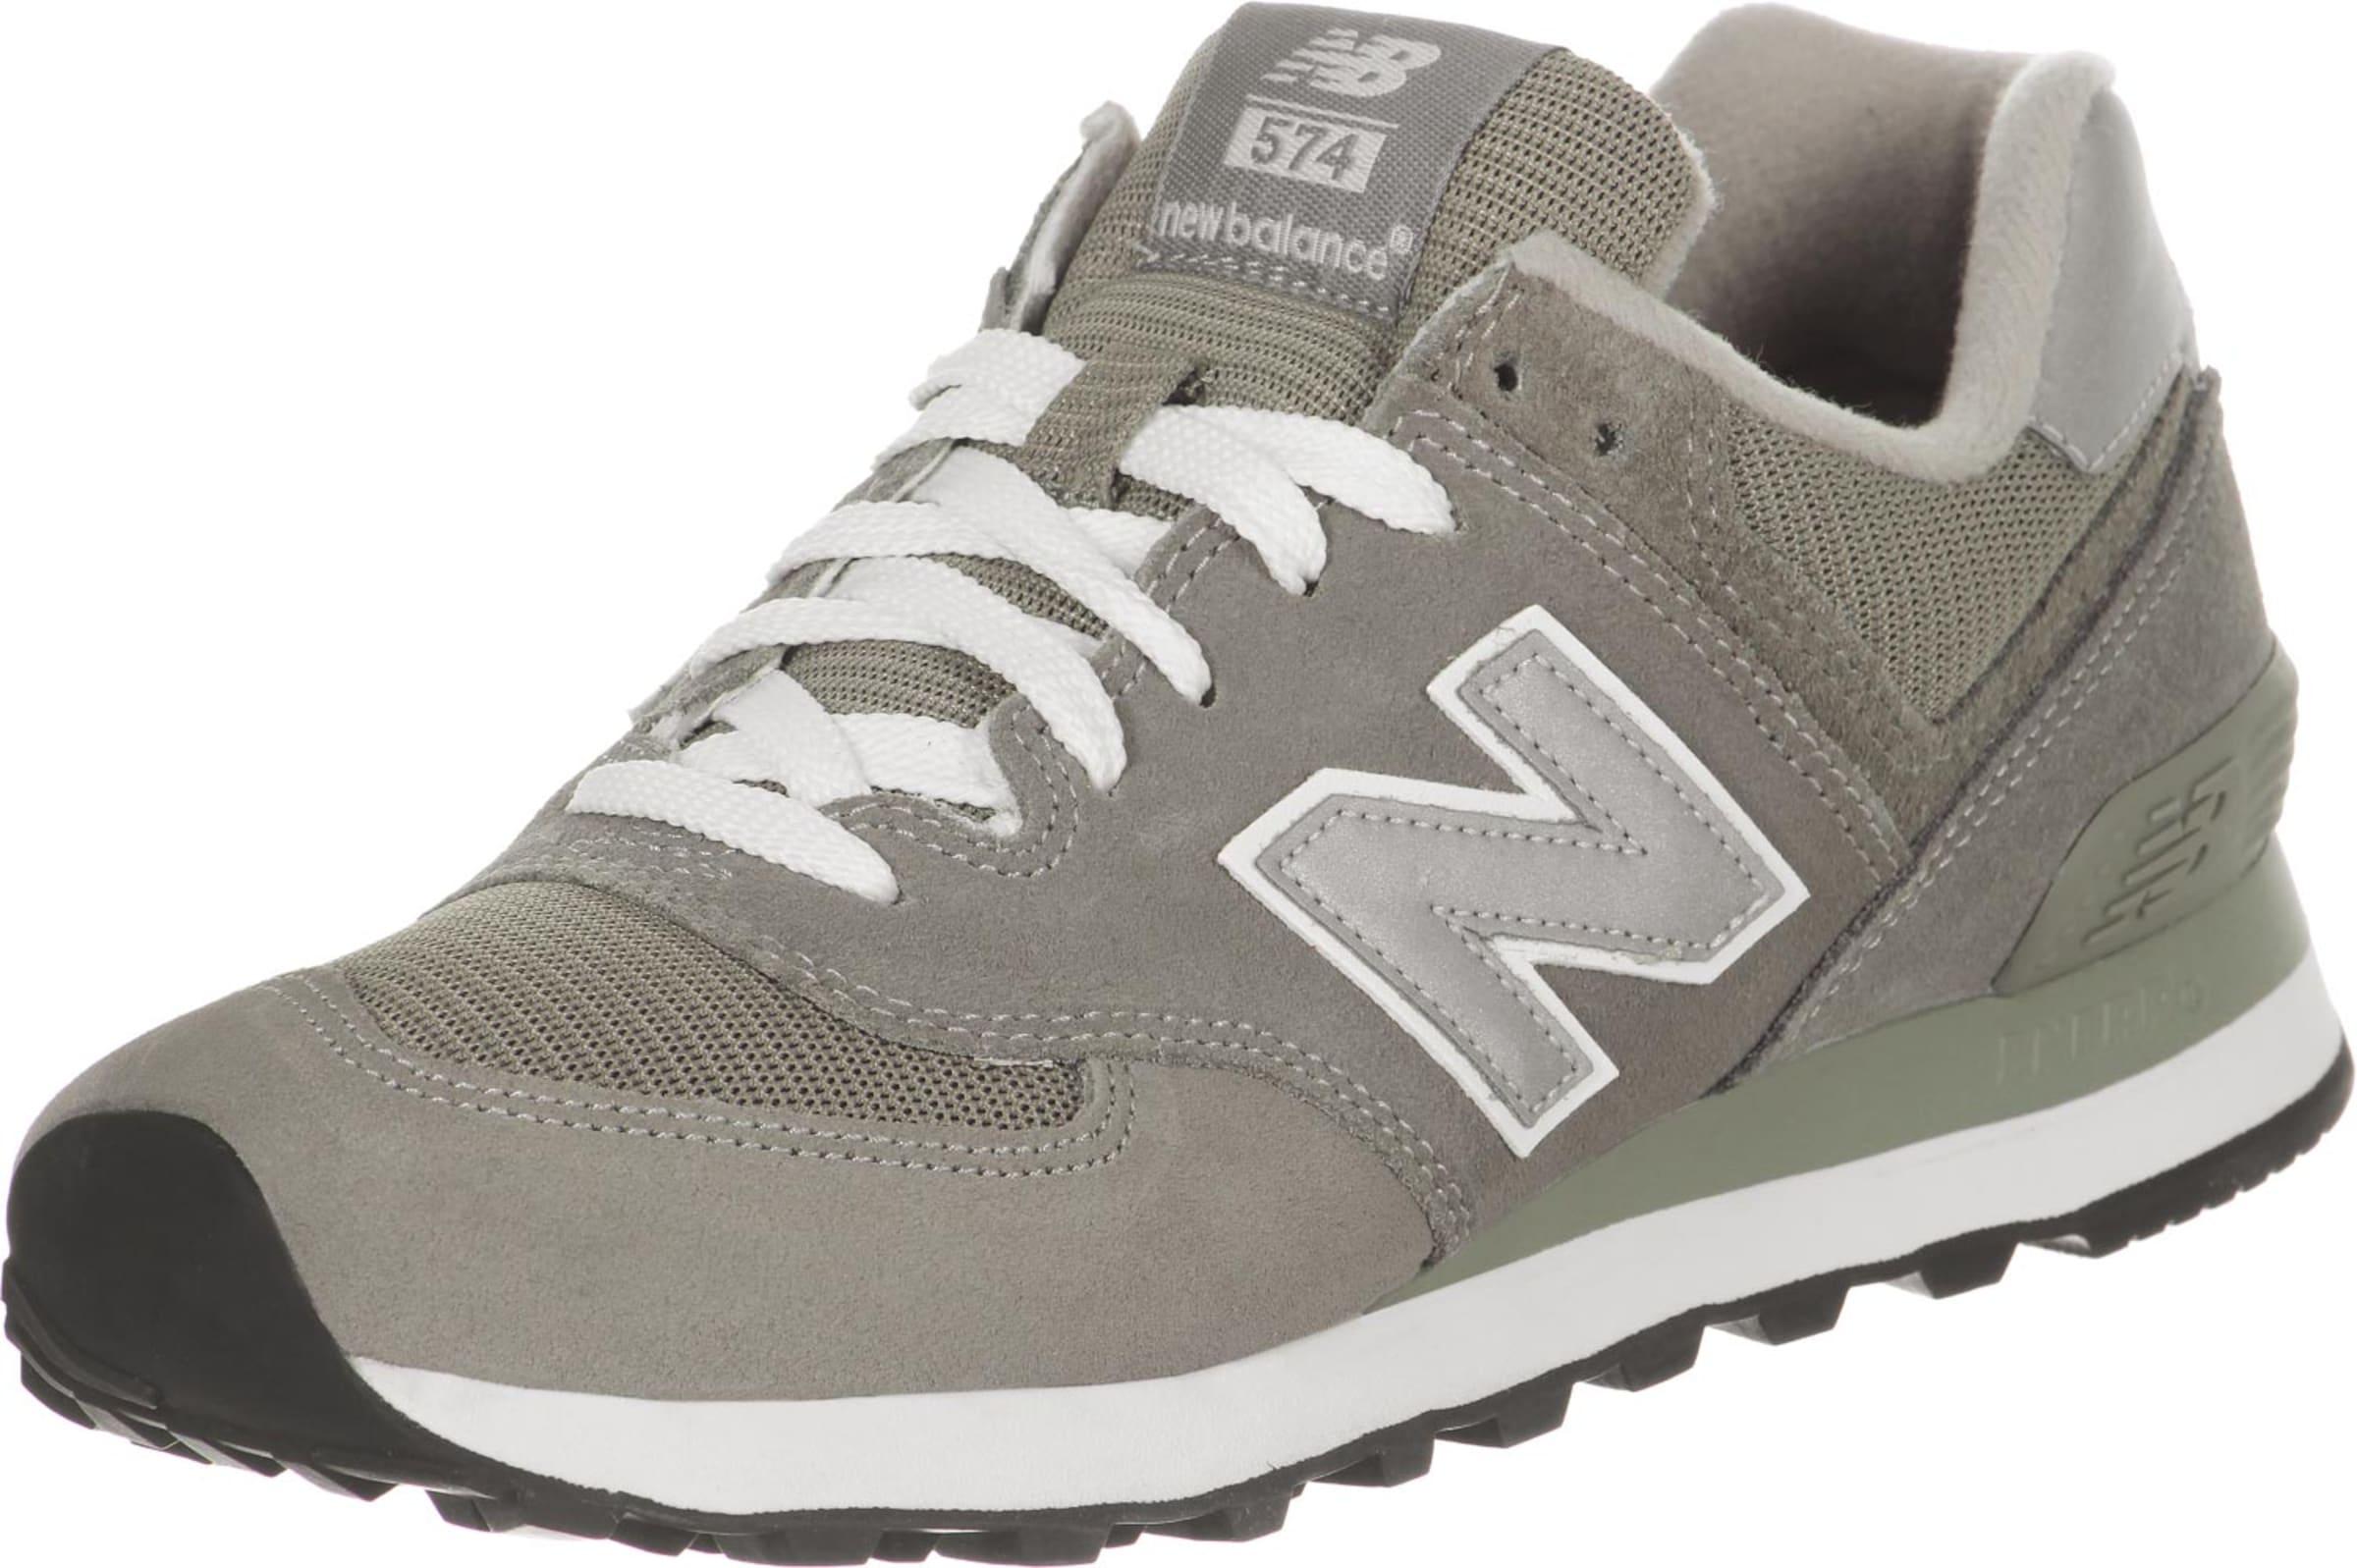 New Balance In Retro M574 Sneaker optik Grau BdrCxoe